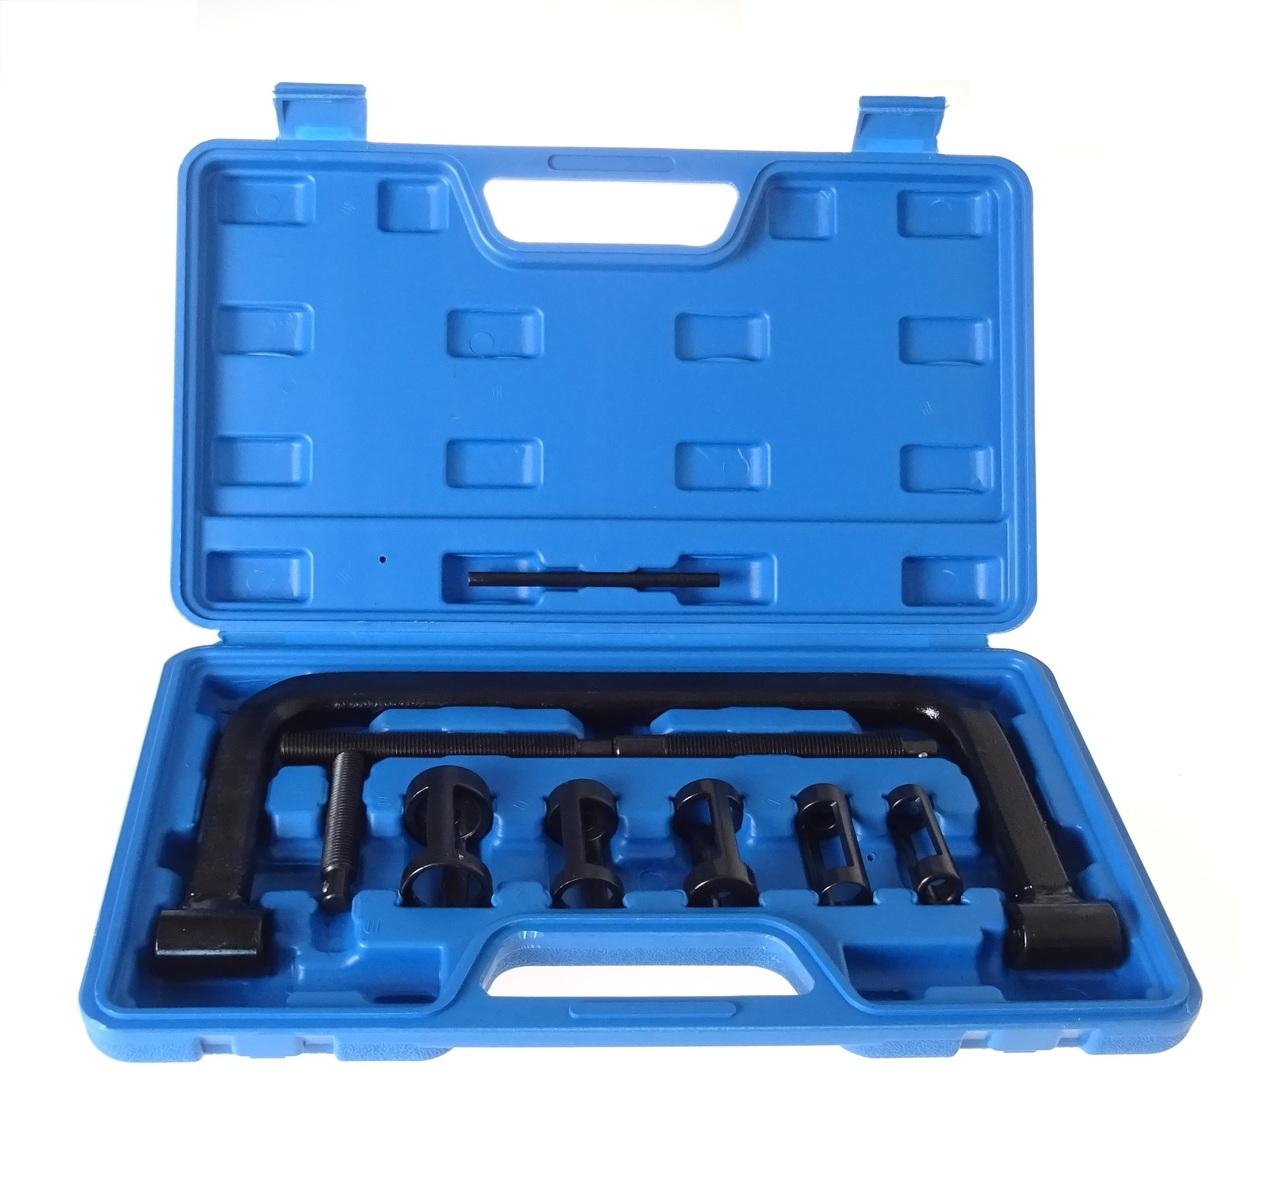 Přípravek na stlačení ventilových pružin, adaptéry 16 - 30 mm - QUATROS QS40101